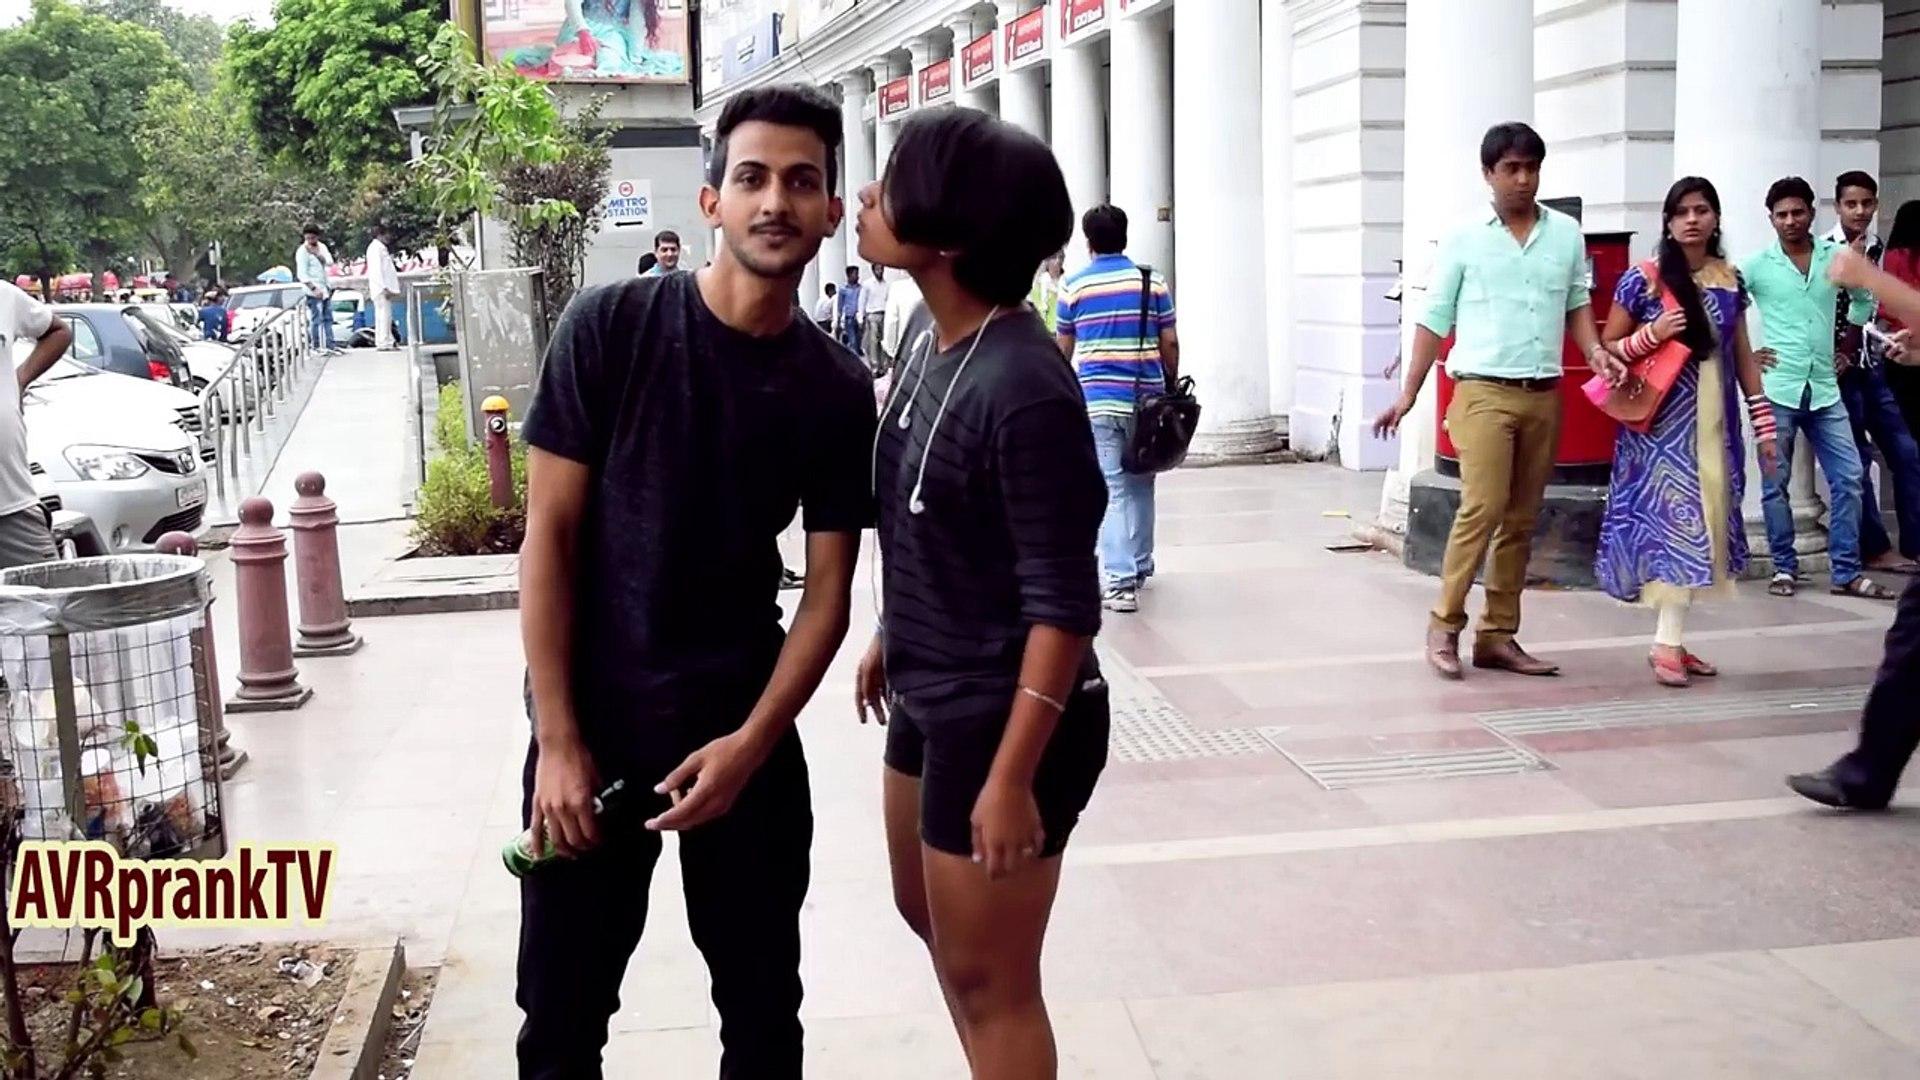 Kissing-Prank-India-Spin-The-Bottle-AVRprankTV